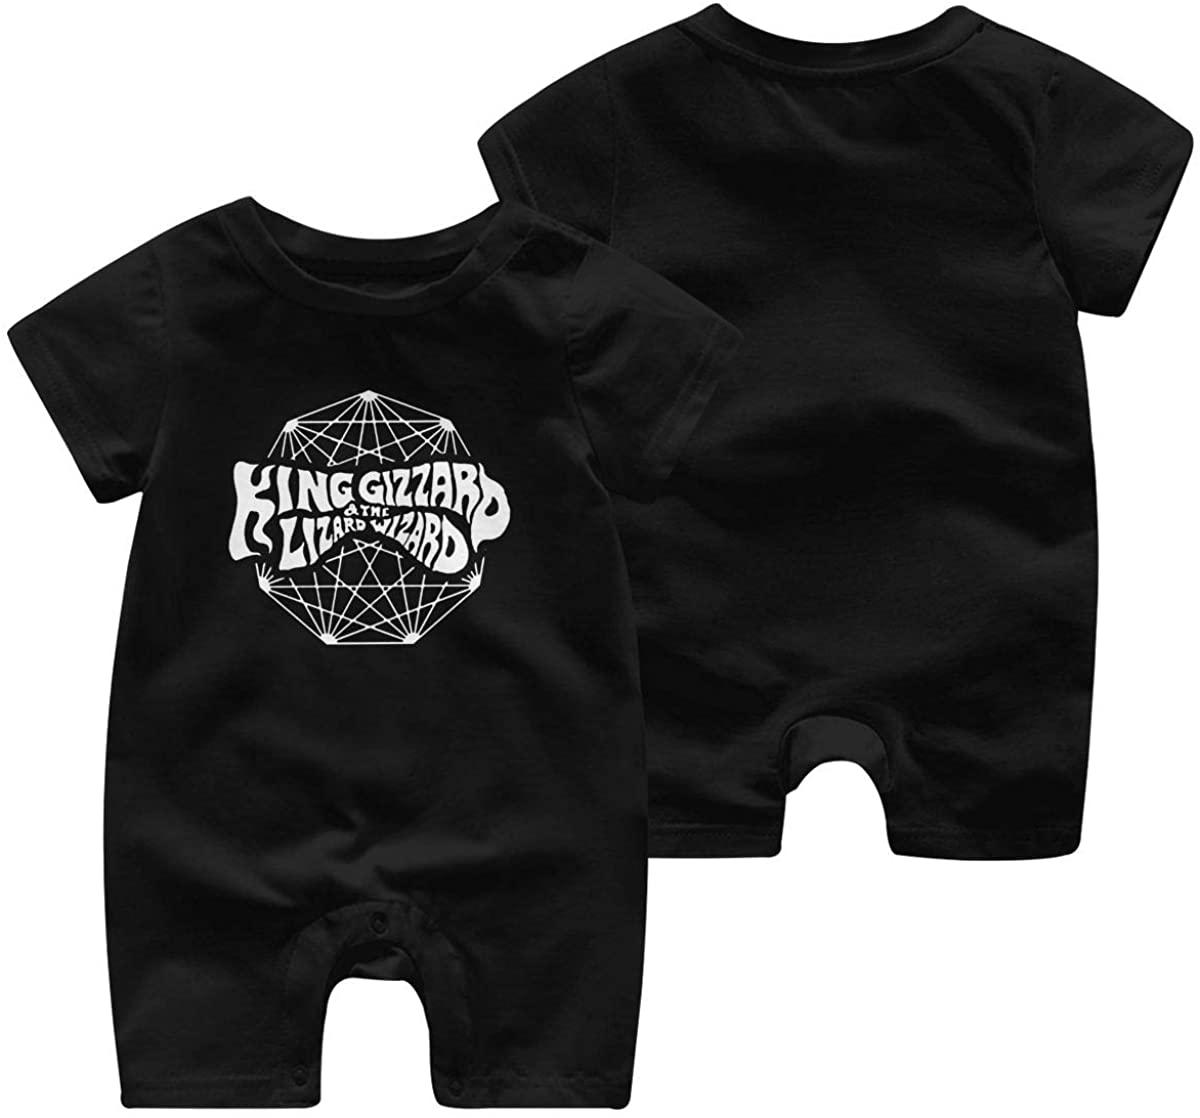 King Gizzard and Lizard Wizard Baby boy Girl Short Sleeve Jumpsuit Short Sleeve Bodysuit Baby Funny Jumpsuit